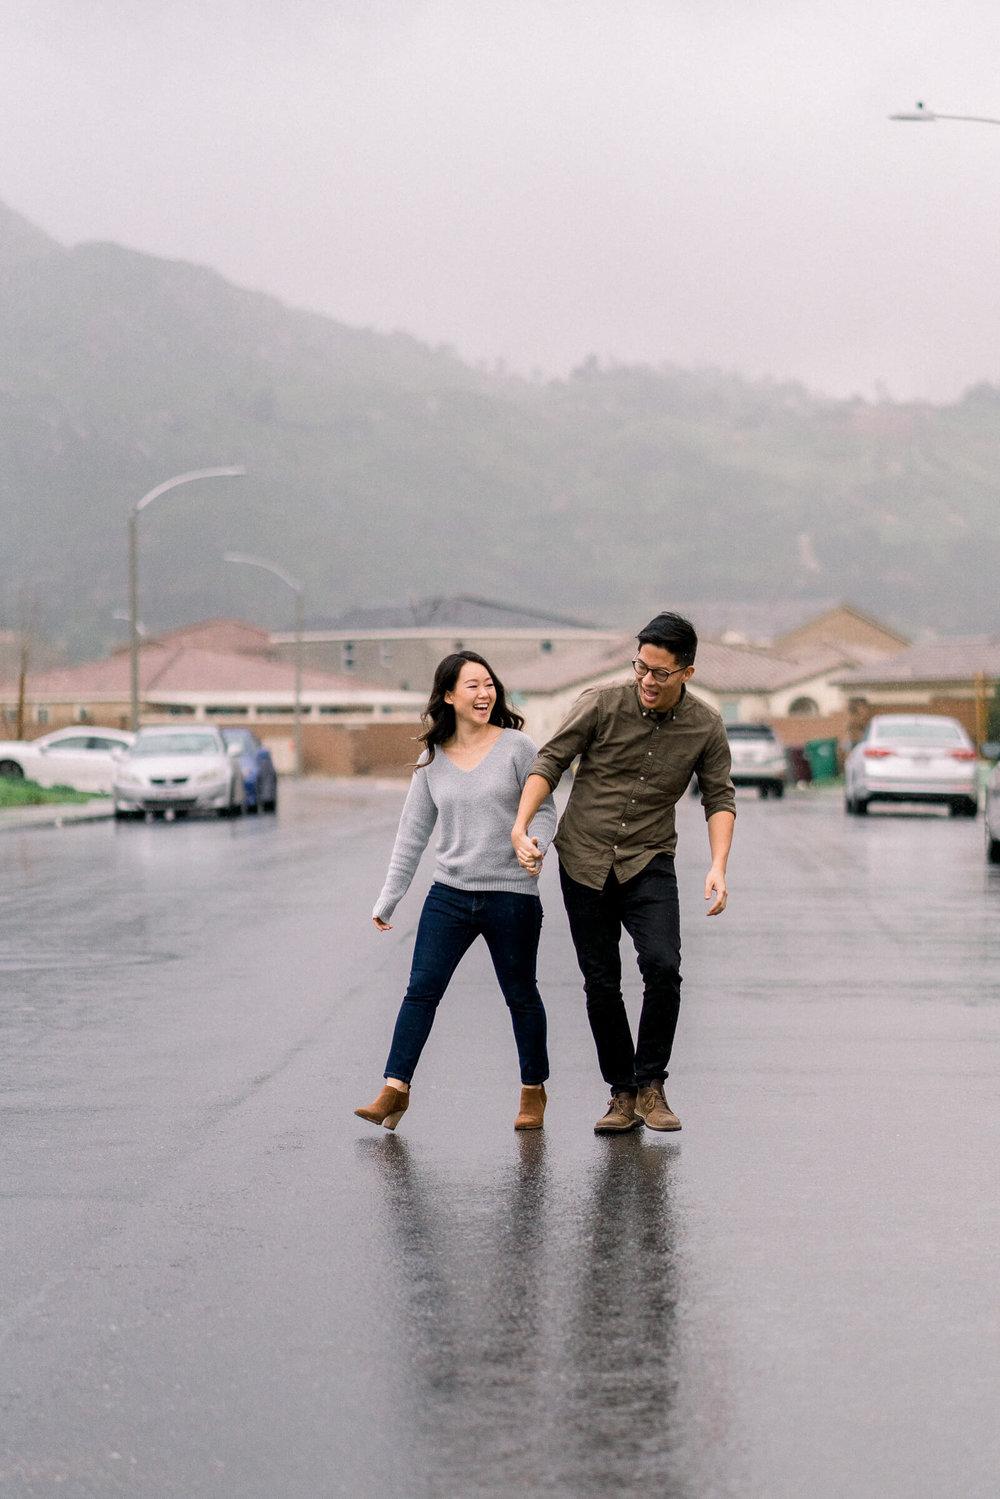 rainy-surprise-proposal-5.jpg